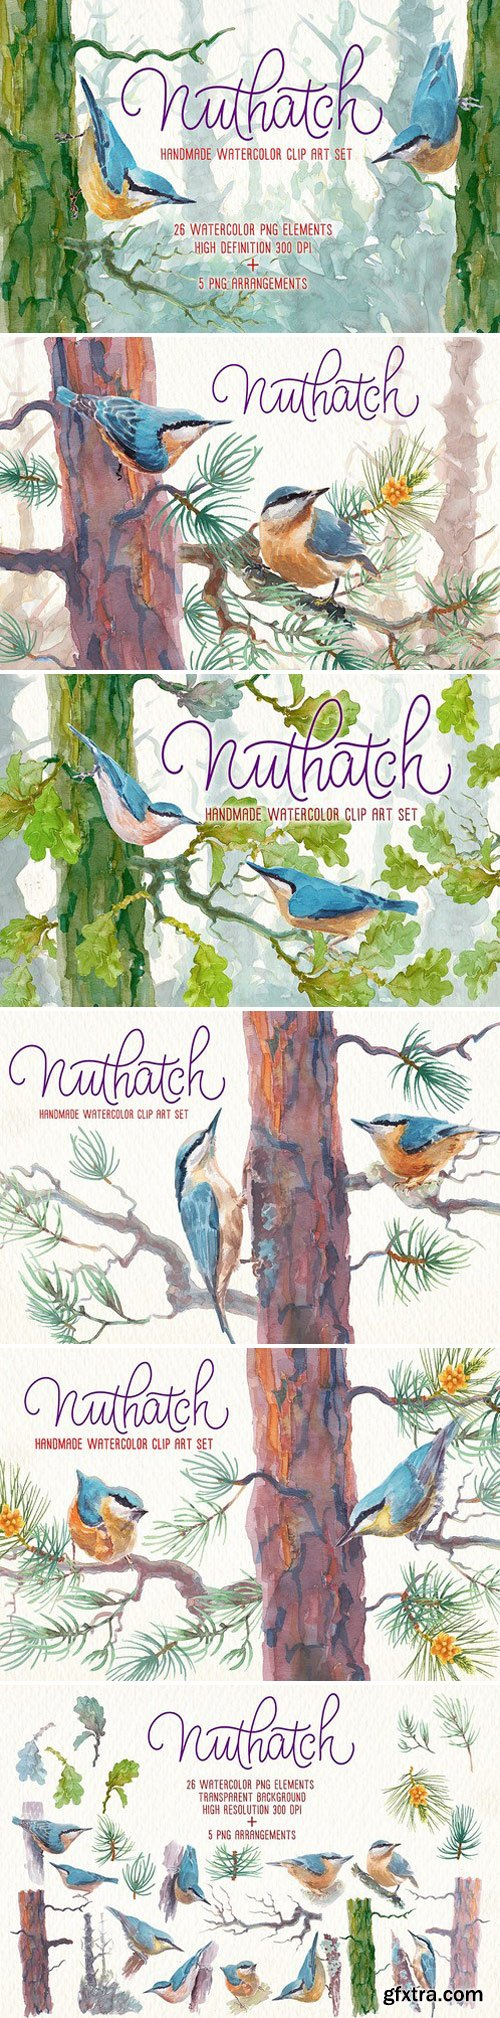 CM - Nuthatch watercolor clipart set 2457736